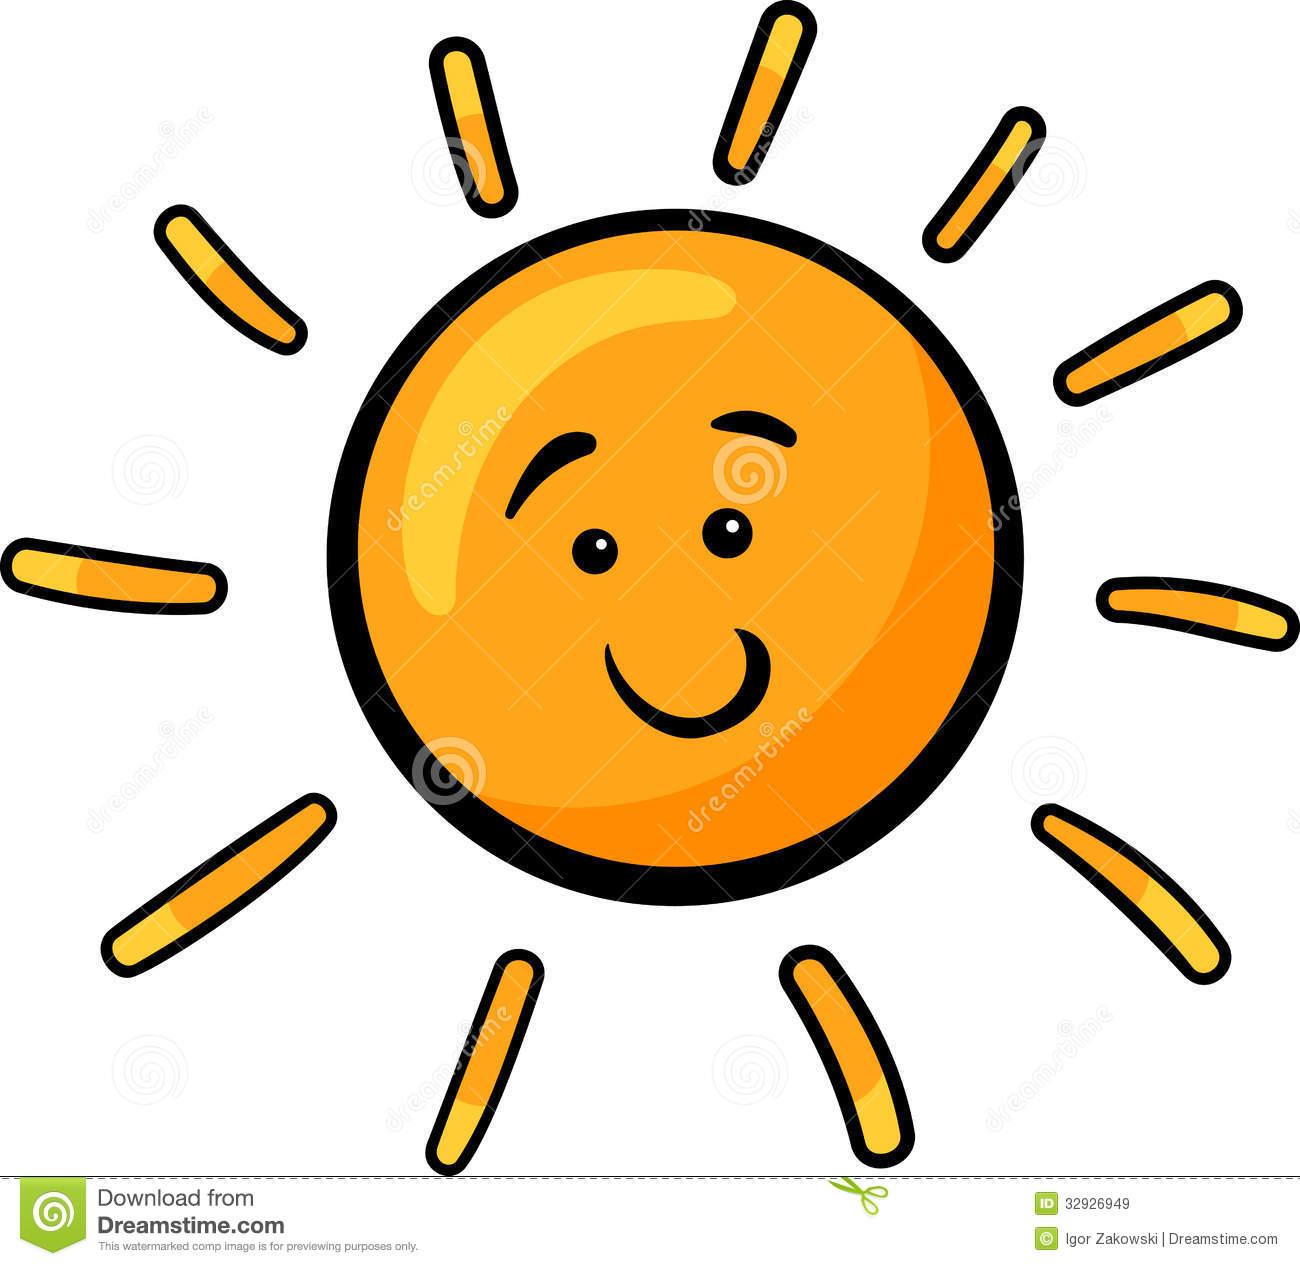 Free Clip Art Images Sunshine Sun Clip A-Free Clip Art Images Sunshine Sun Clip Art Cartoon Illustration-1